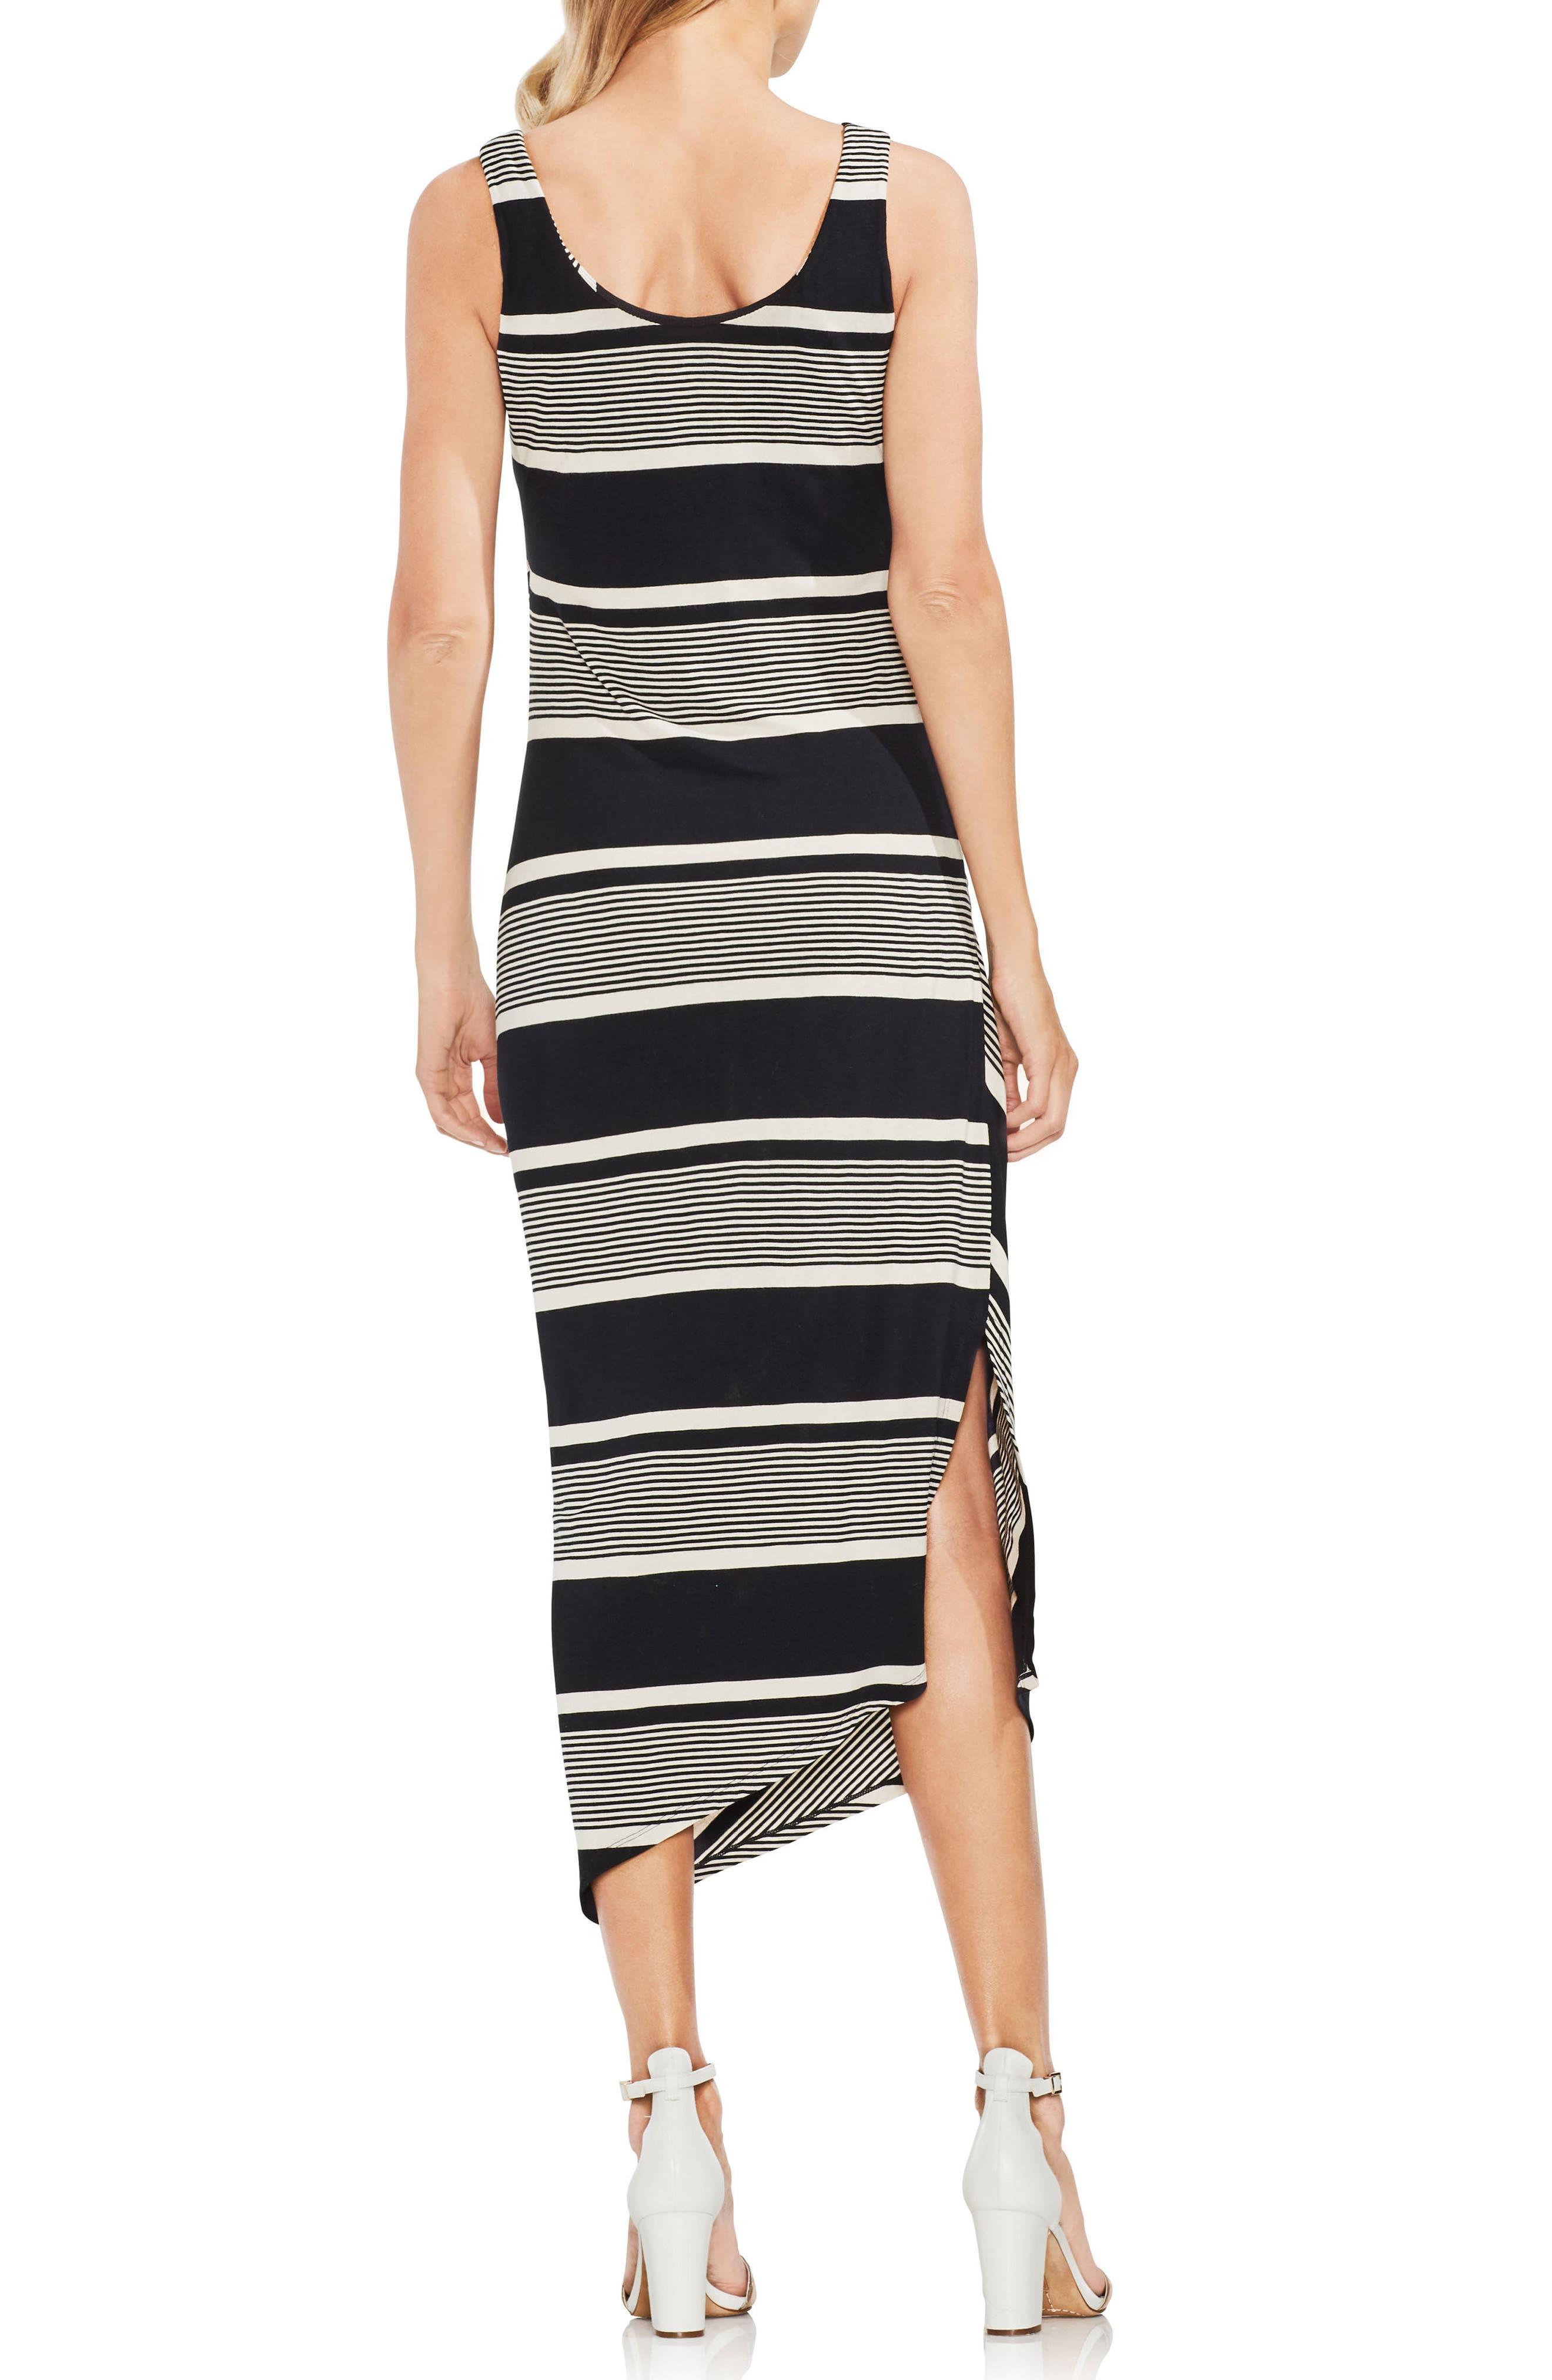 Venue Block Stripe Ruched Body-Con Dress,                             Alternate thumbnail 2, color,                             060-Rich Black